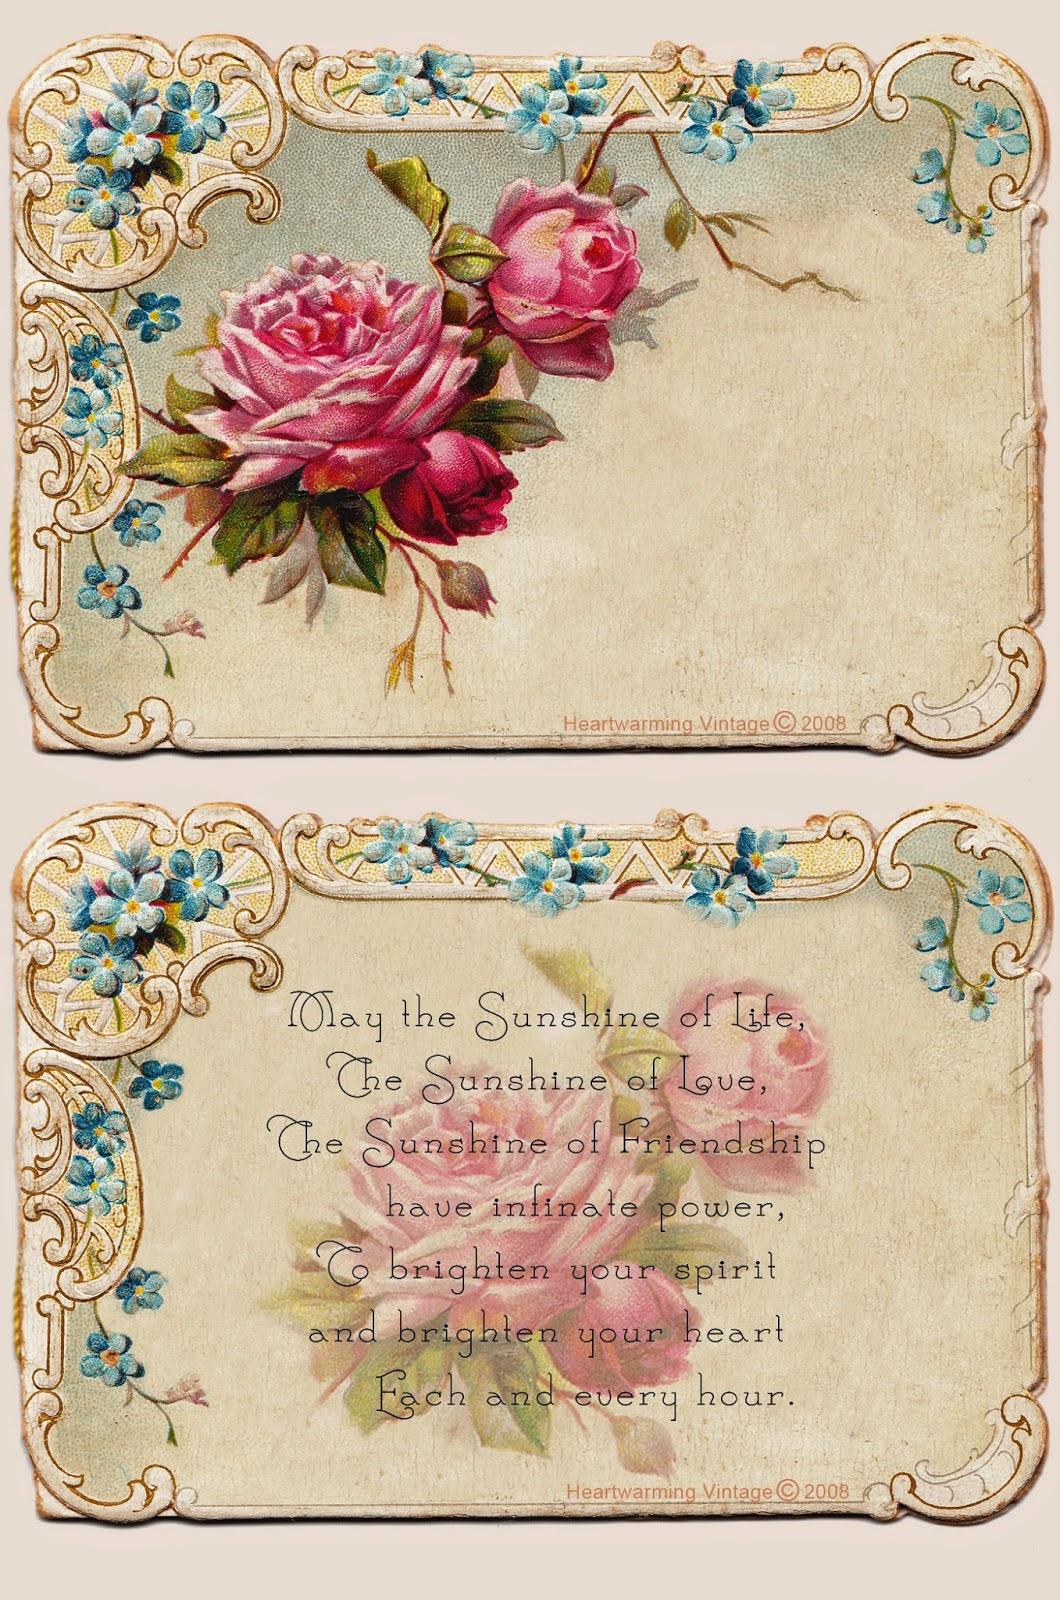 http://2.bp.blogspot.com/-qxdXKluRVAk/VPsAZa4OBBI/AAAAAAAAS7M/fFK0iH2l1bM/s1600/CraftySecrets-pink-roses-free-printable-2008.jpg